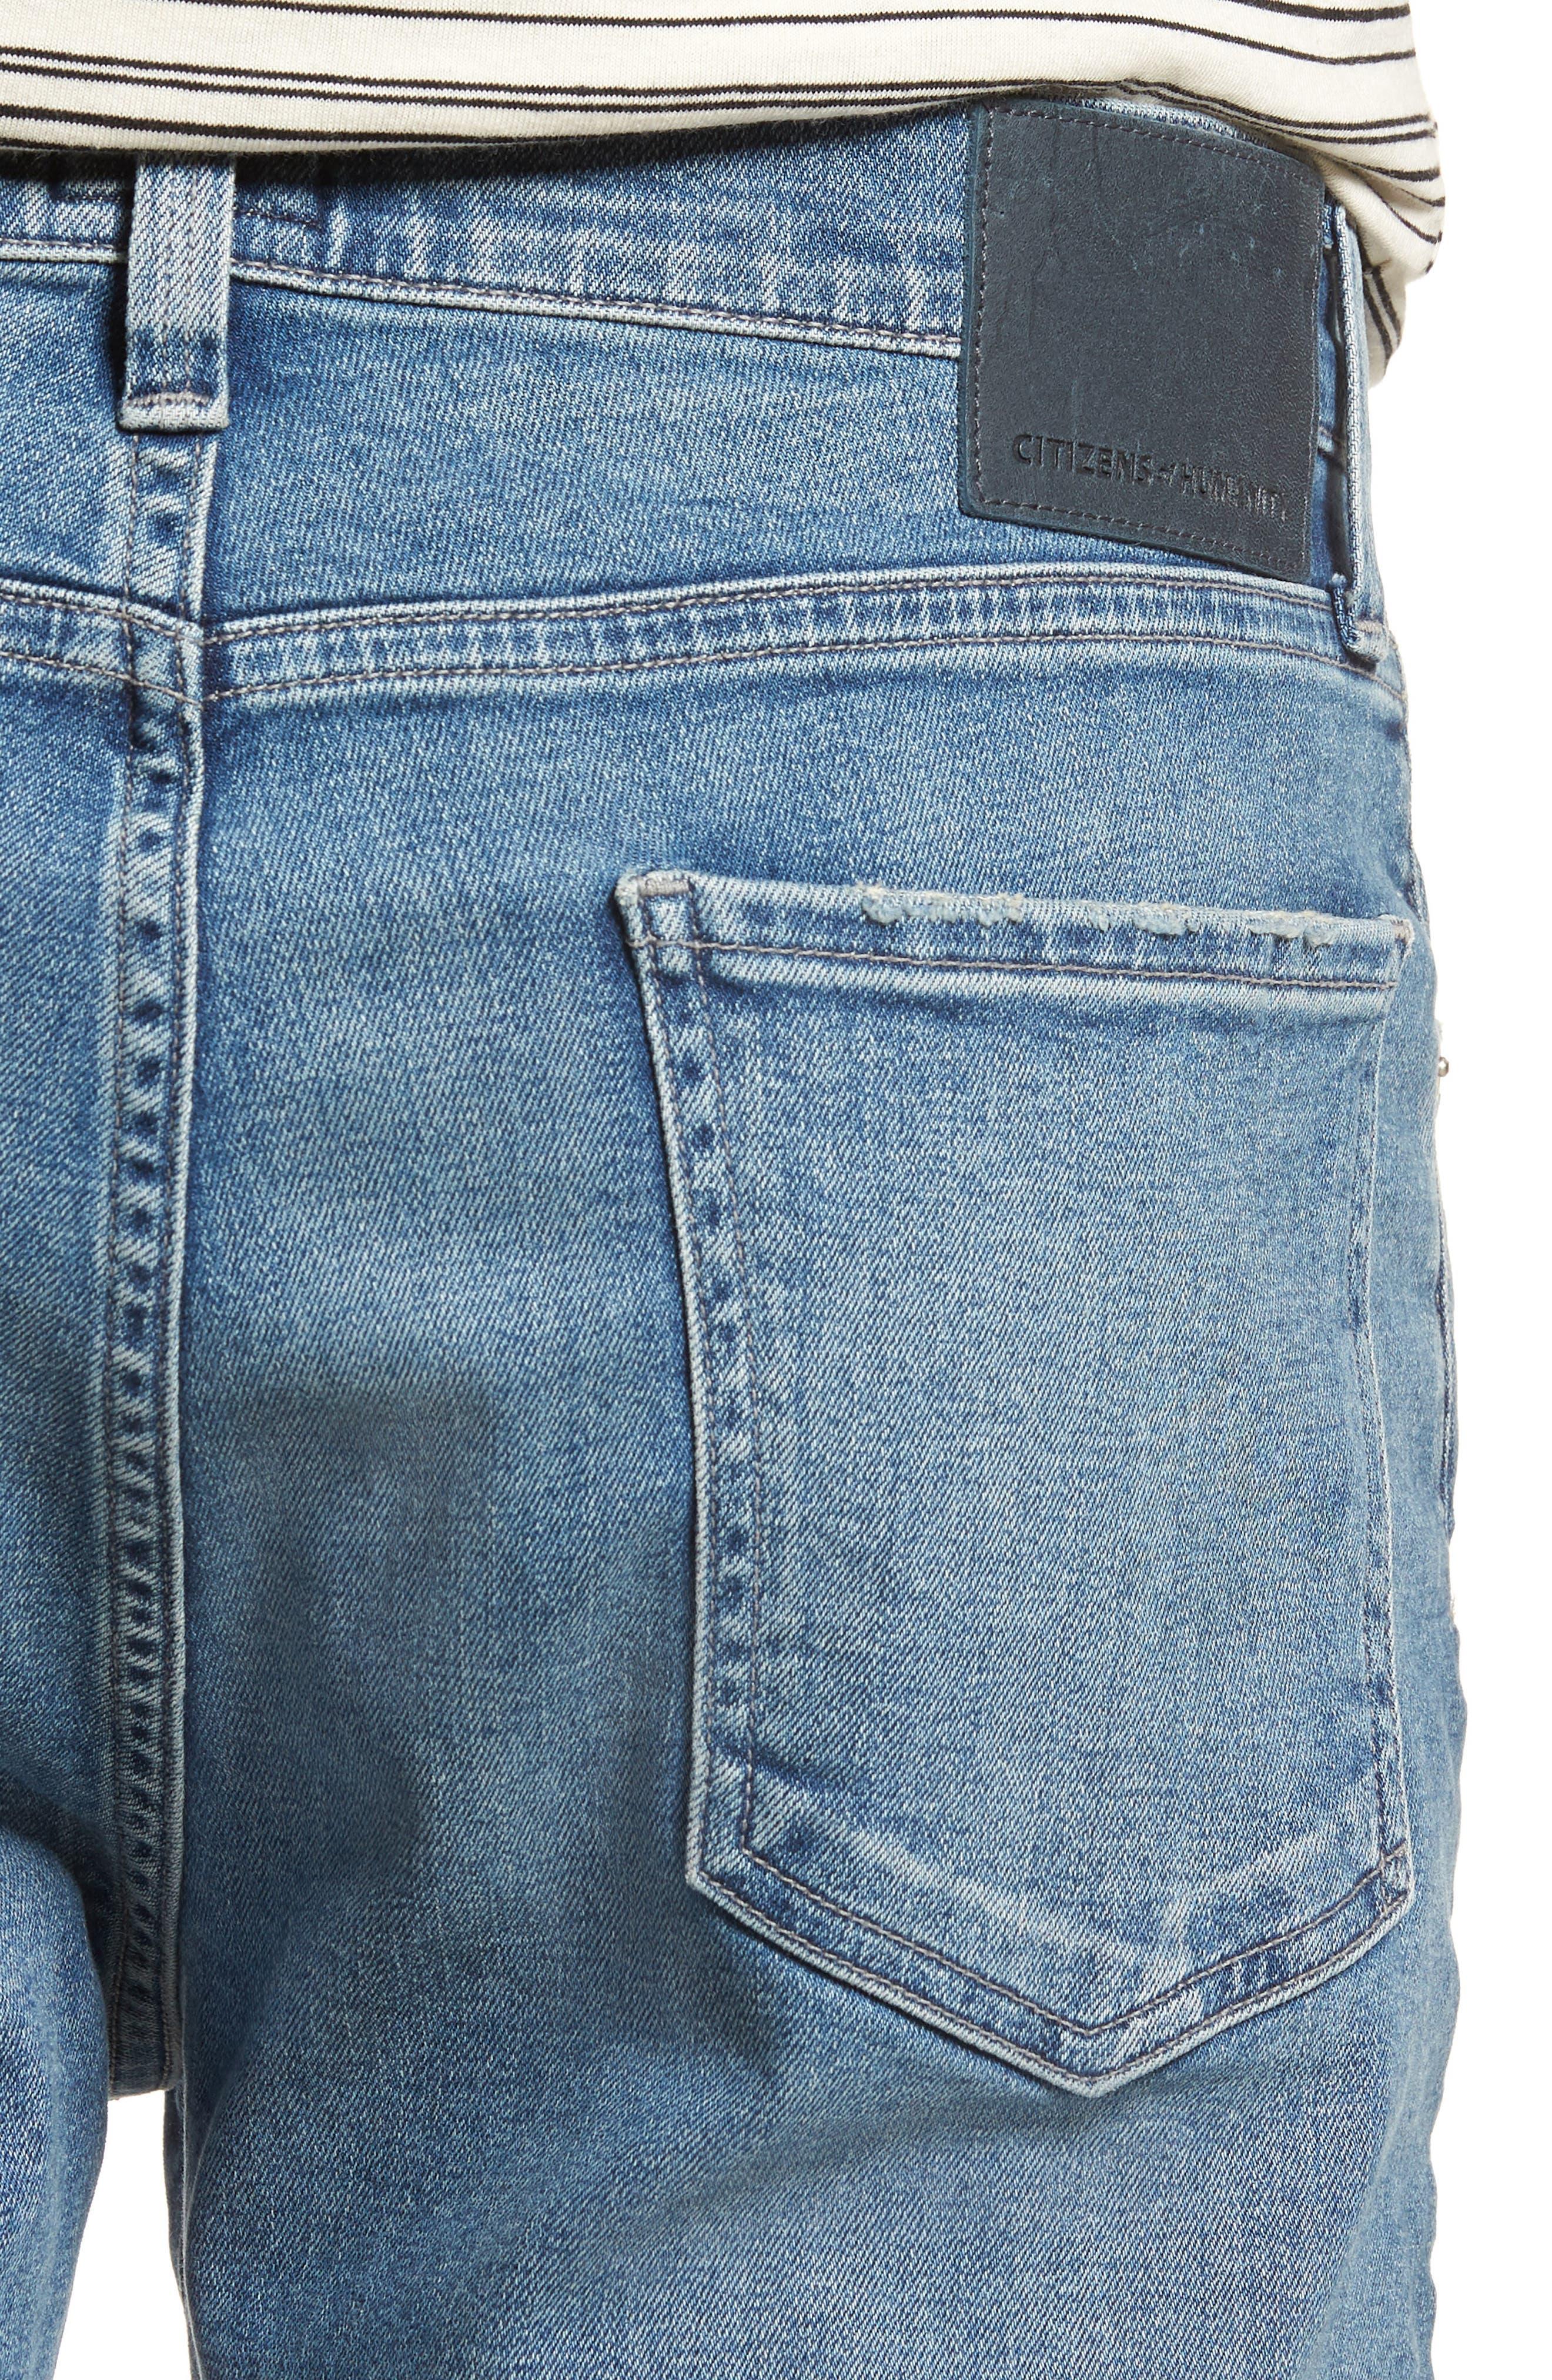 Gage Slim Straight Leg Jeans,                             Alternate thumbnail 4, color,                             Hemingway